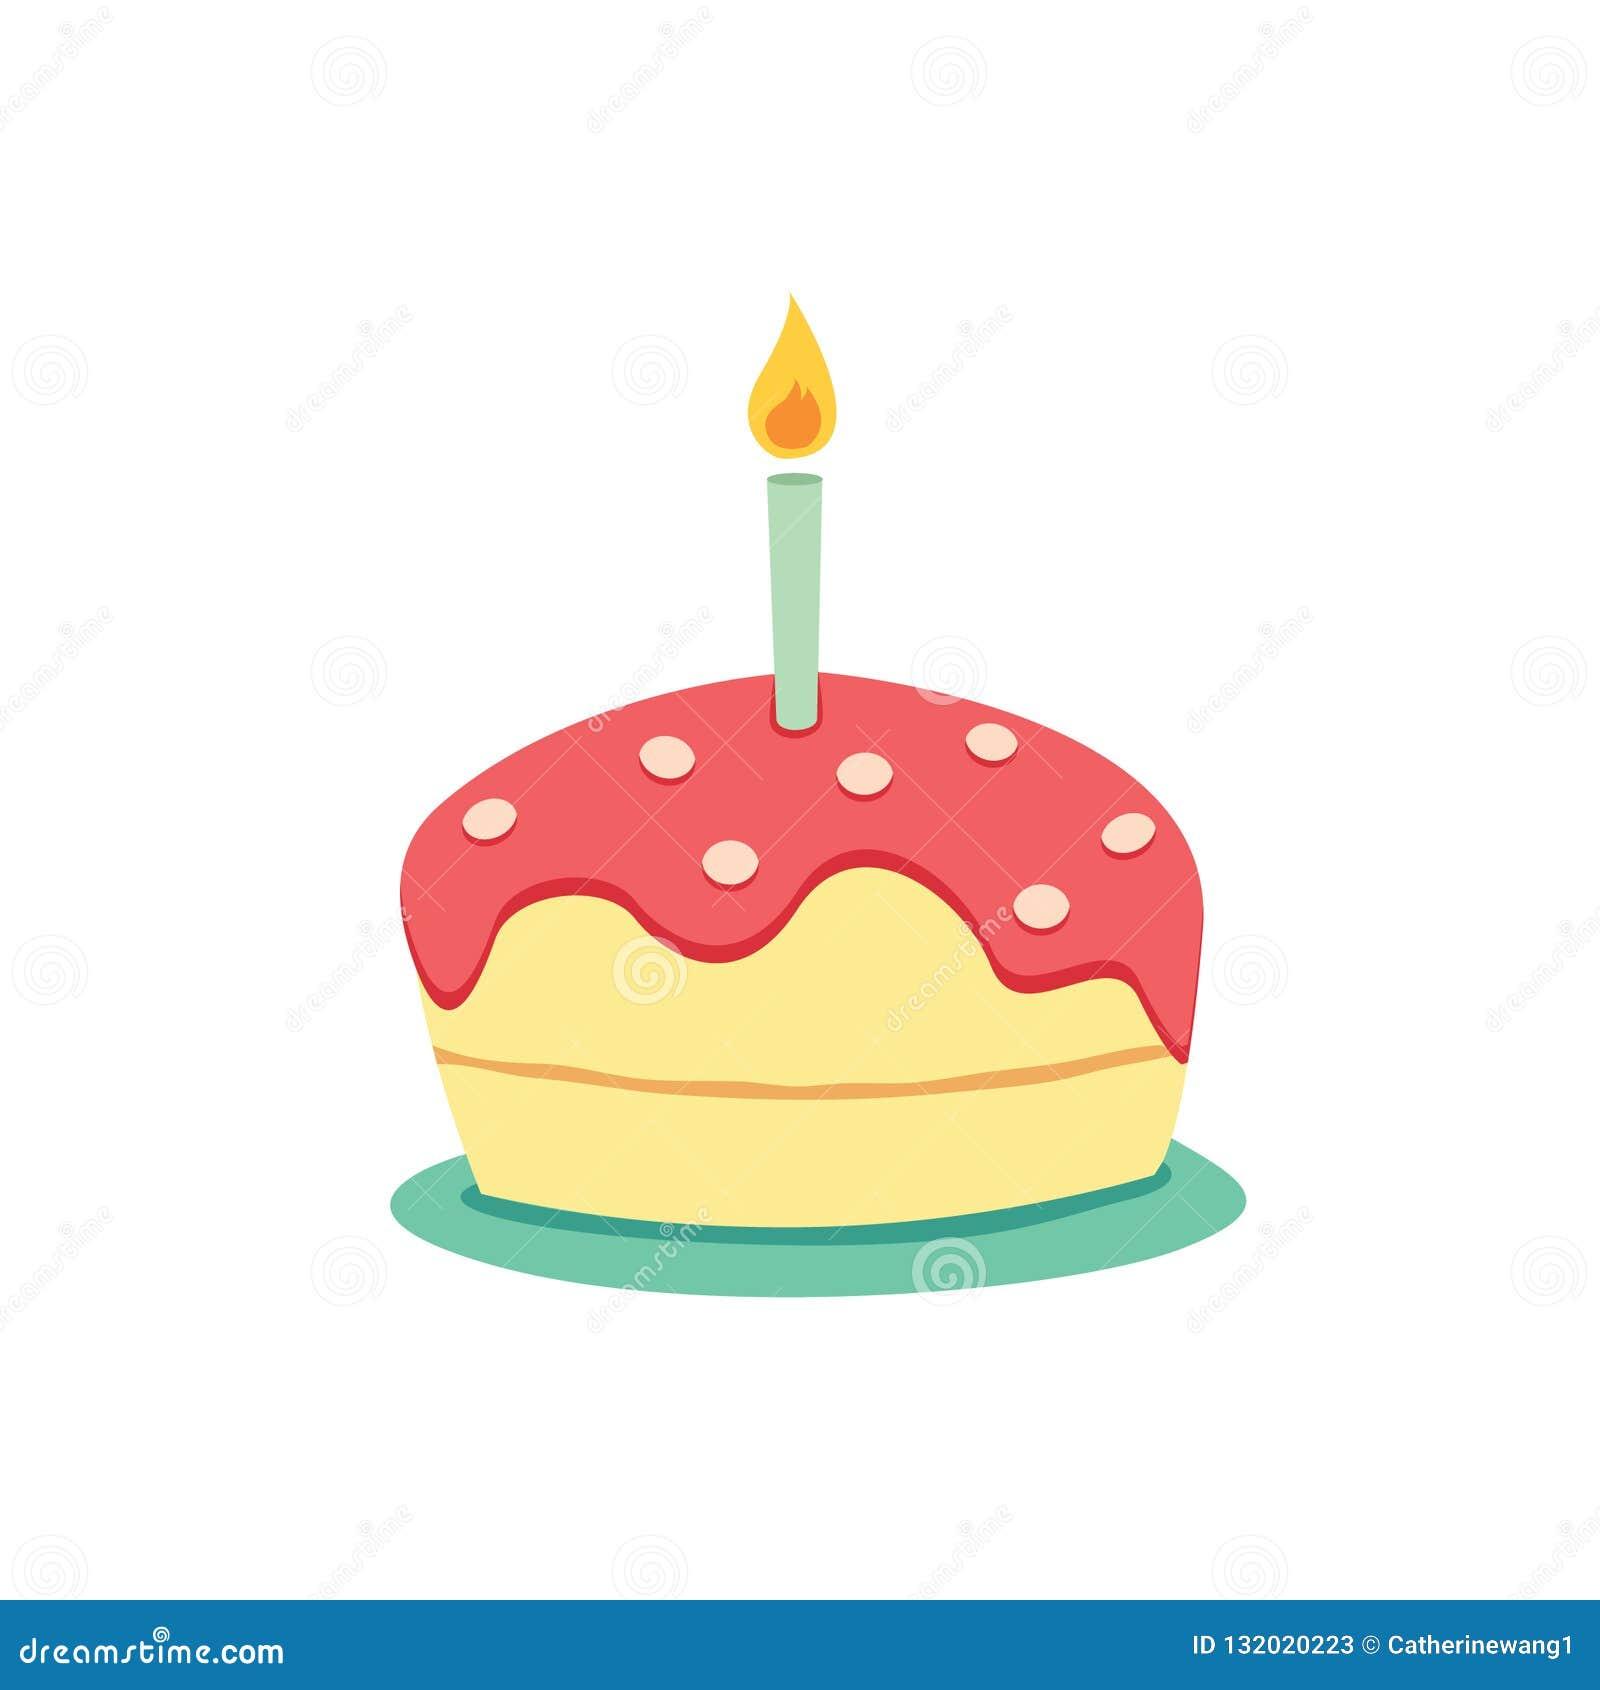 Surprising Simple Birthday Cake With Candle Vector Stock Vector Funny Birthday Cards Online Elaedamsfinfo